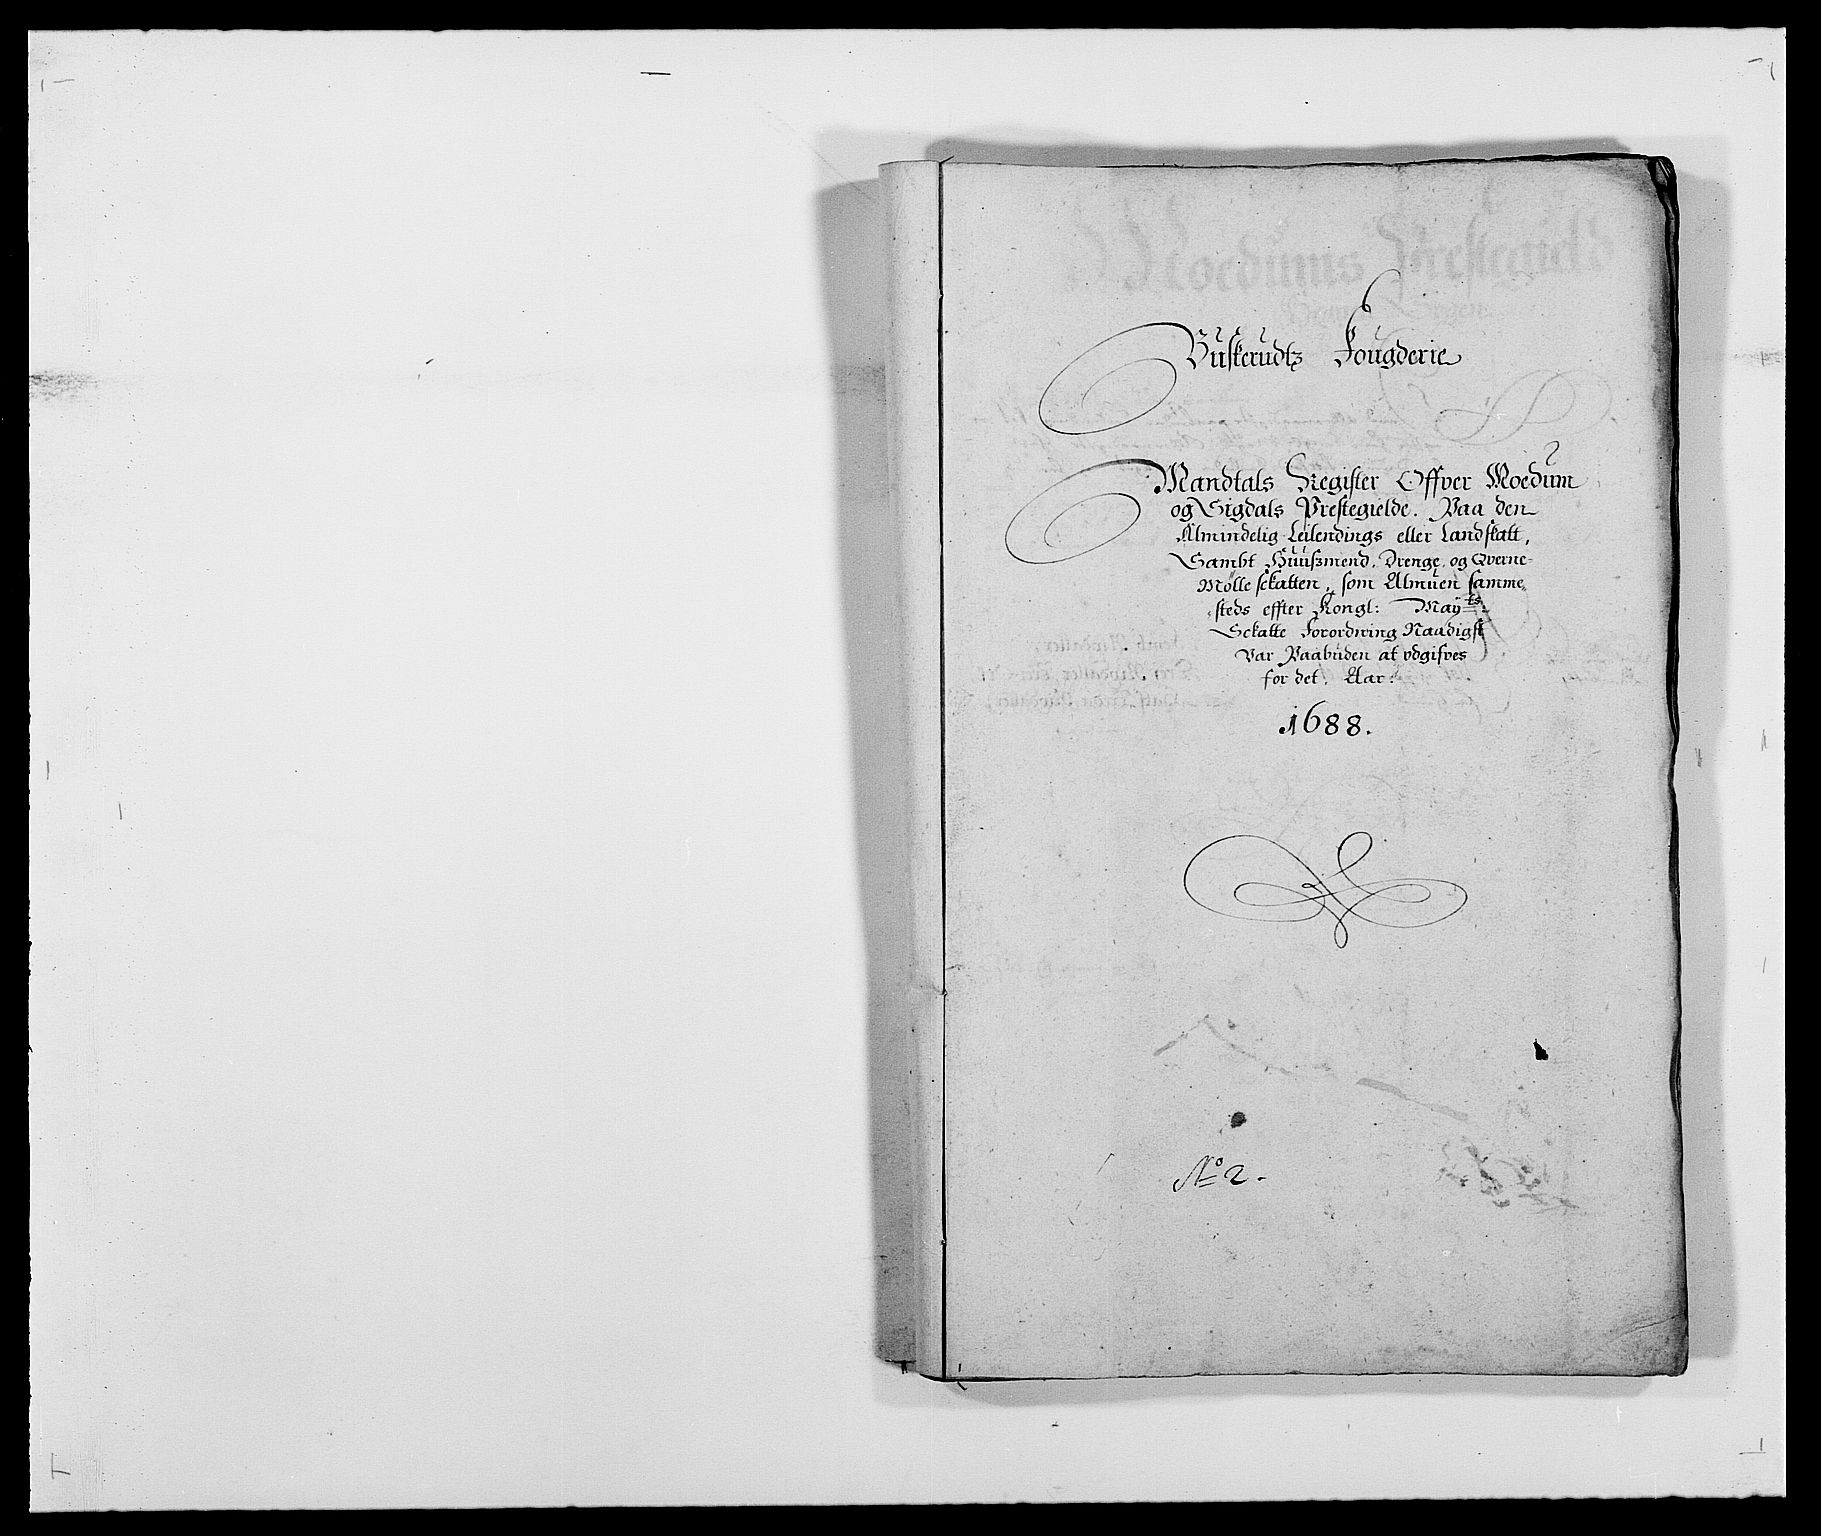 RA, Rentekammeret inntil 1814, Reviderte regnskaper, Fogderegnskap, R25/L1679: Fogderegnskap Buskerud, 1687-1688, s. 302